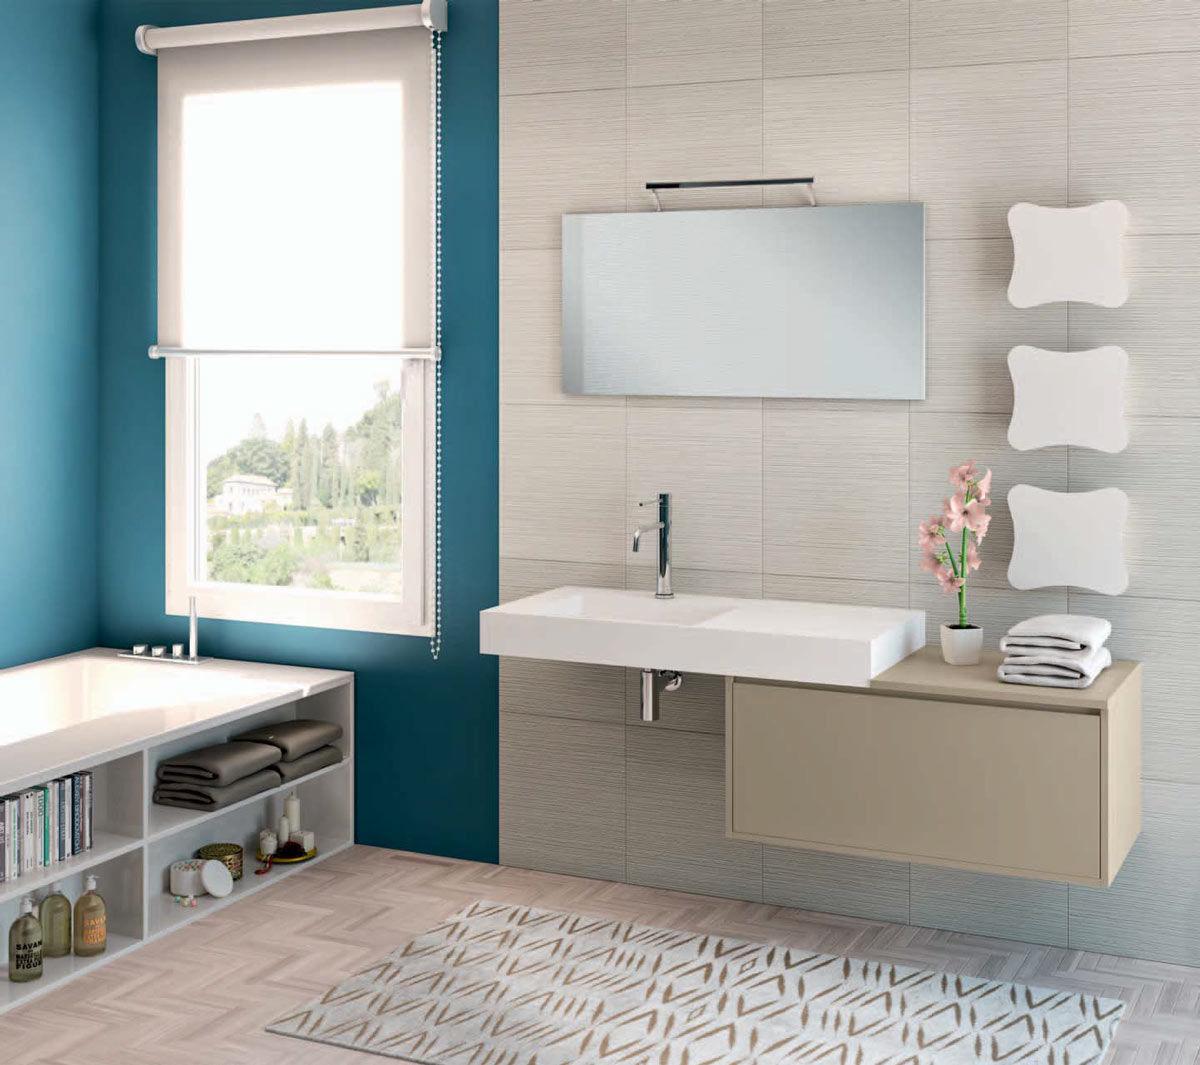 bagni piccoli moderni con vasca